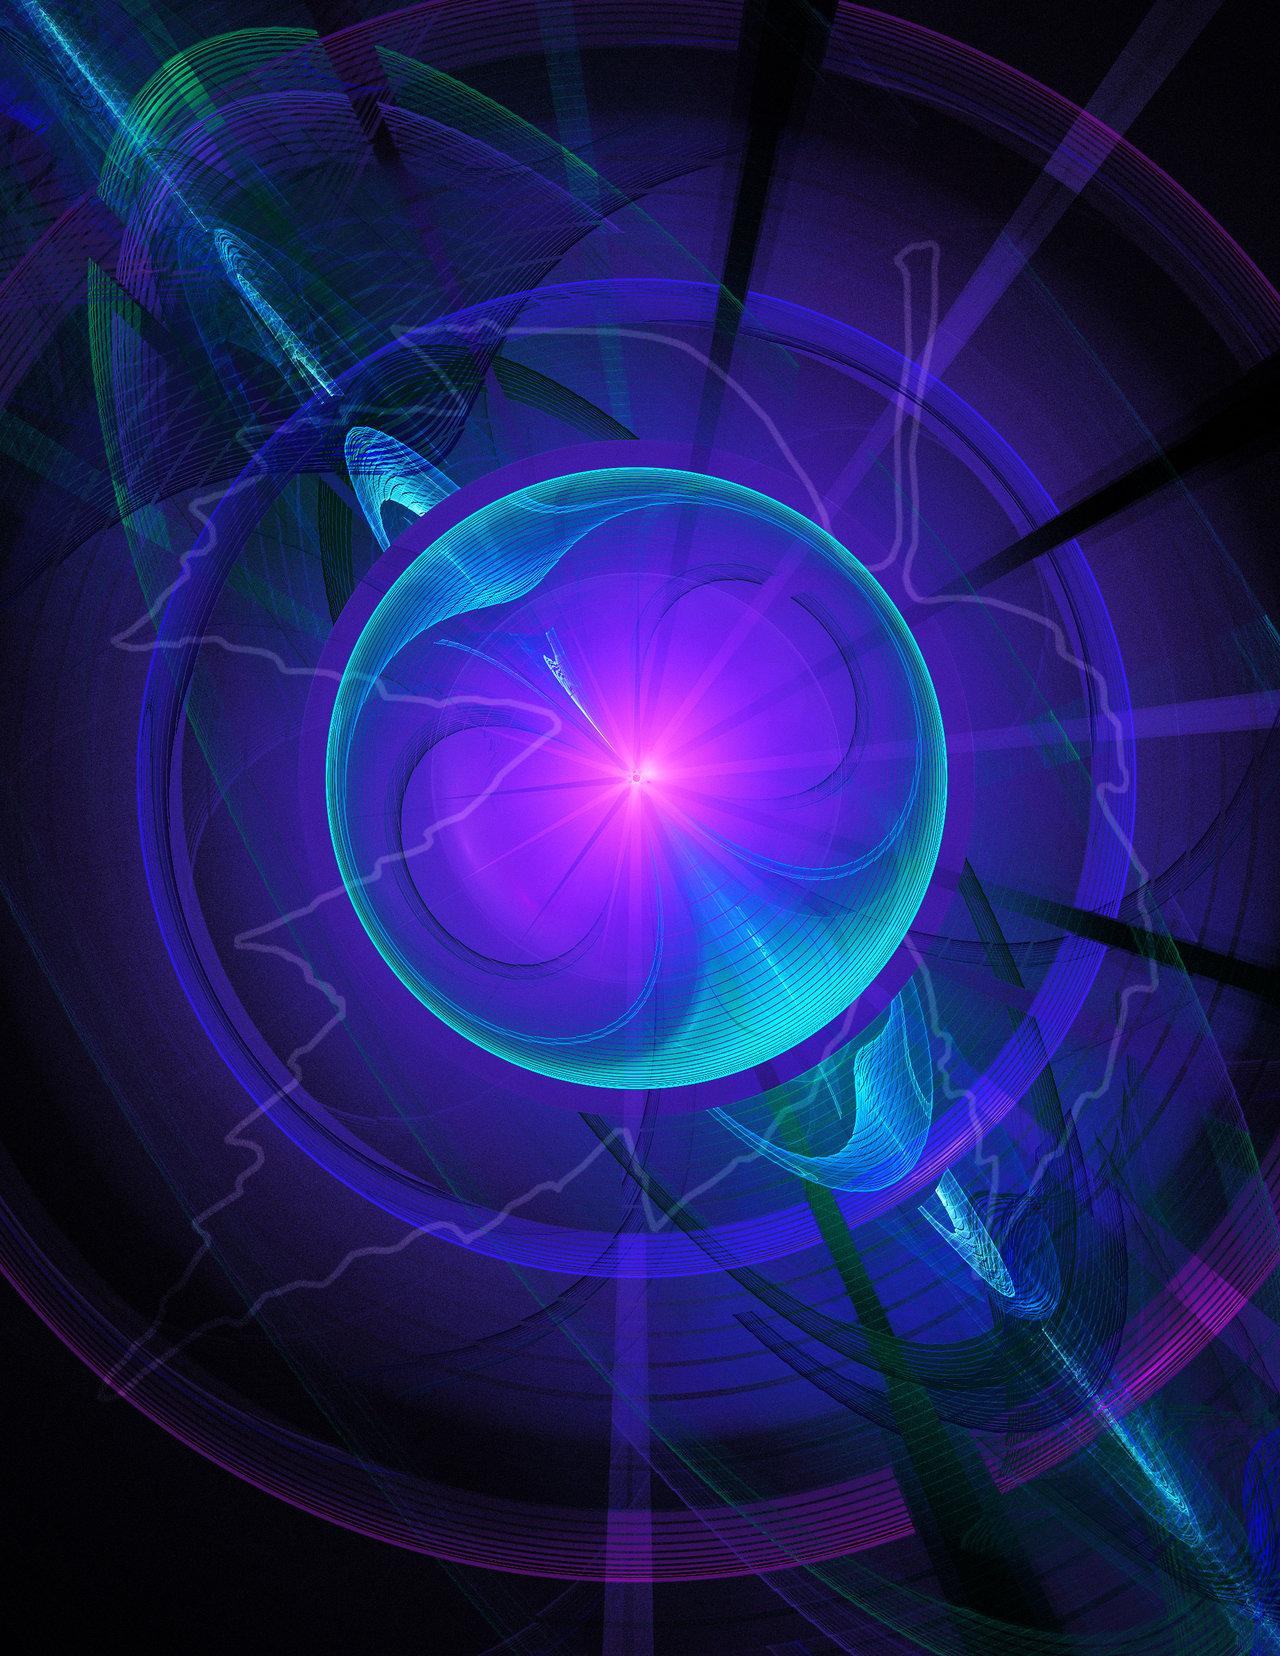 bottom_quark_by_ni66le-d31qv3l